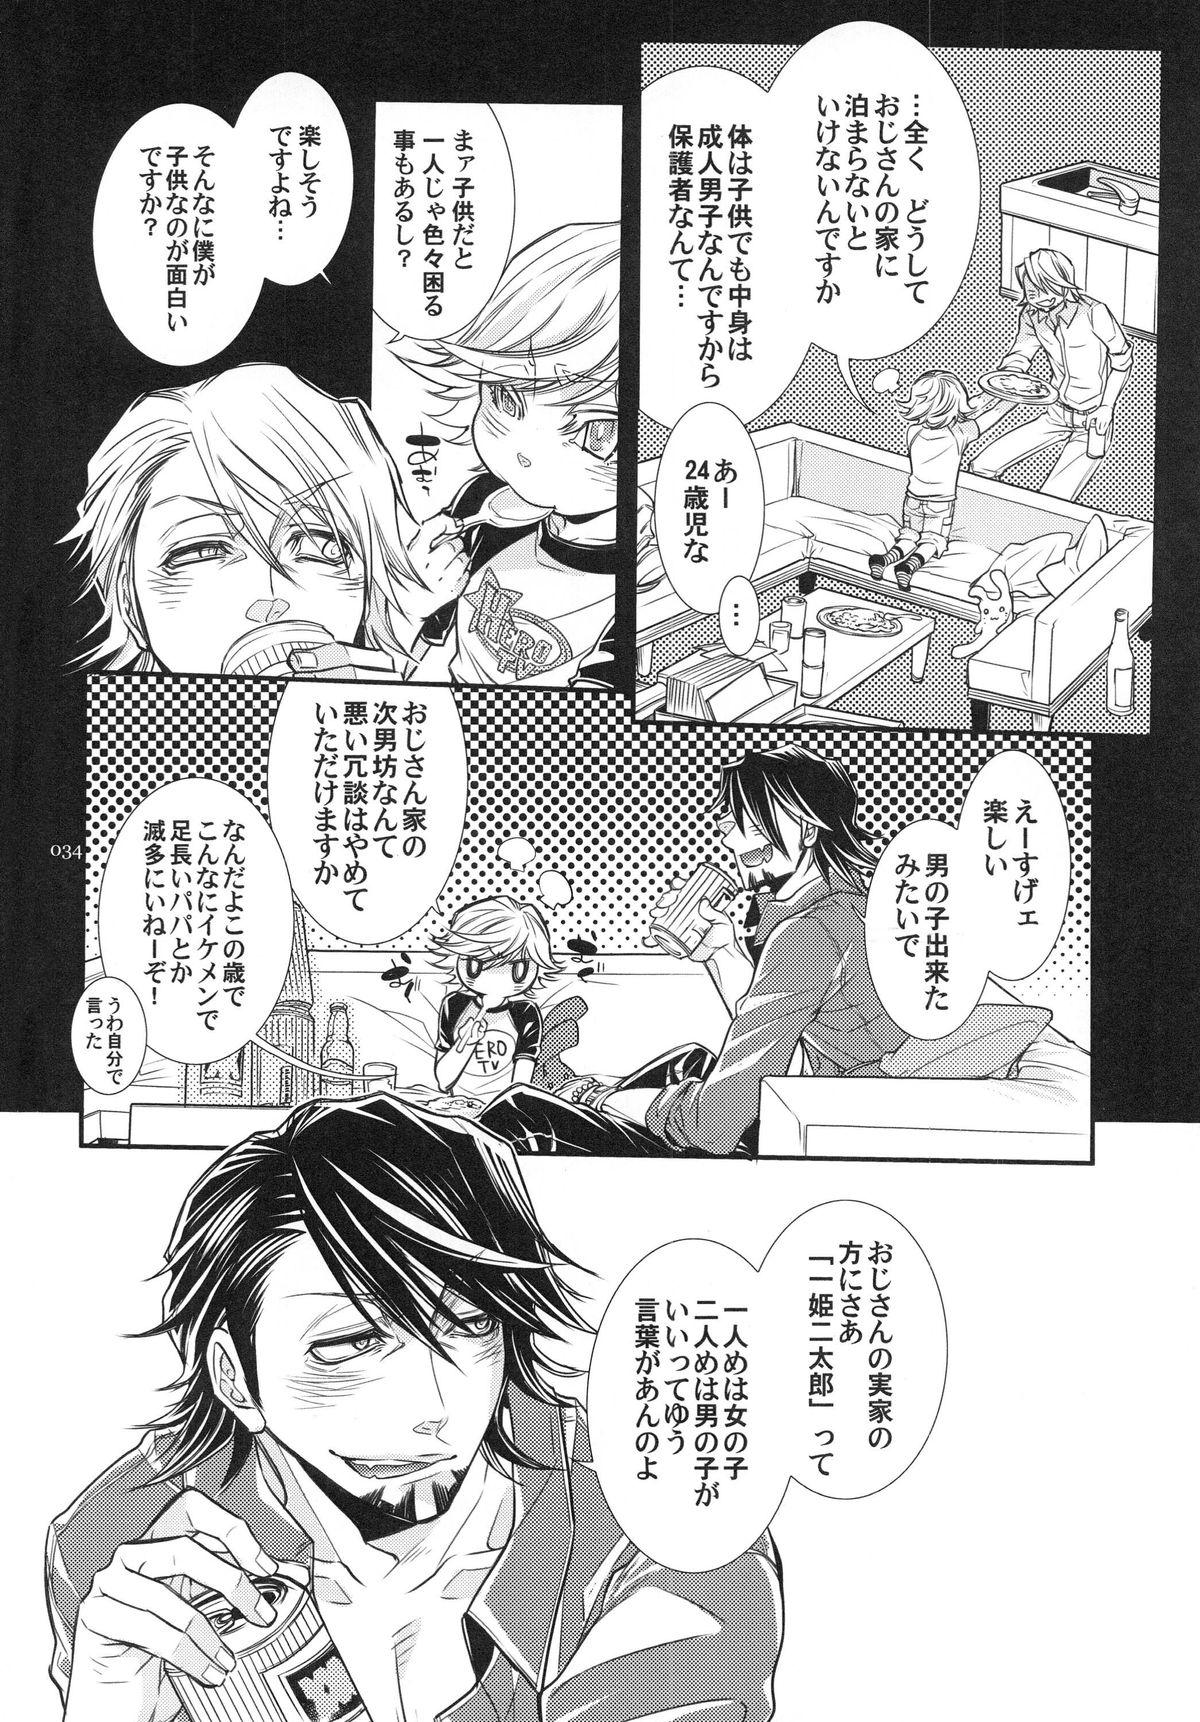 Bunny-chan to Iikoto Shiyokka 33